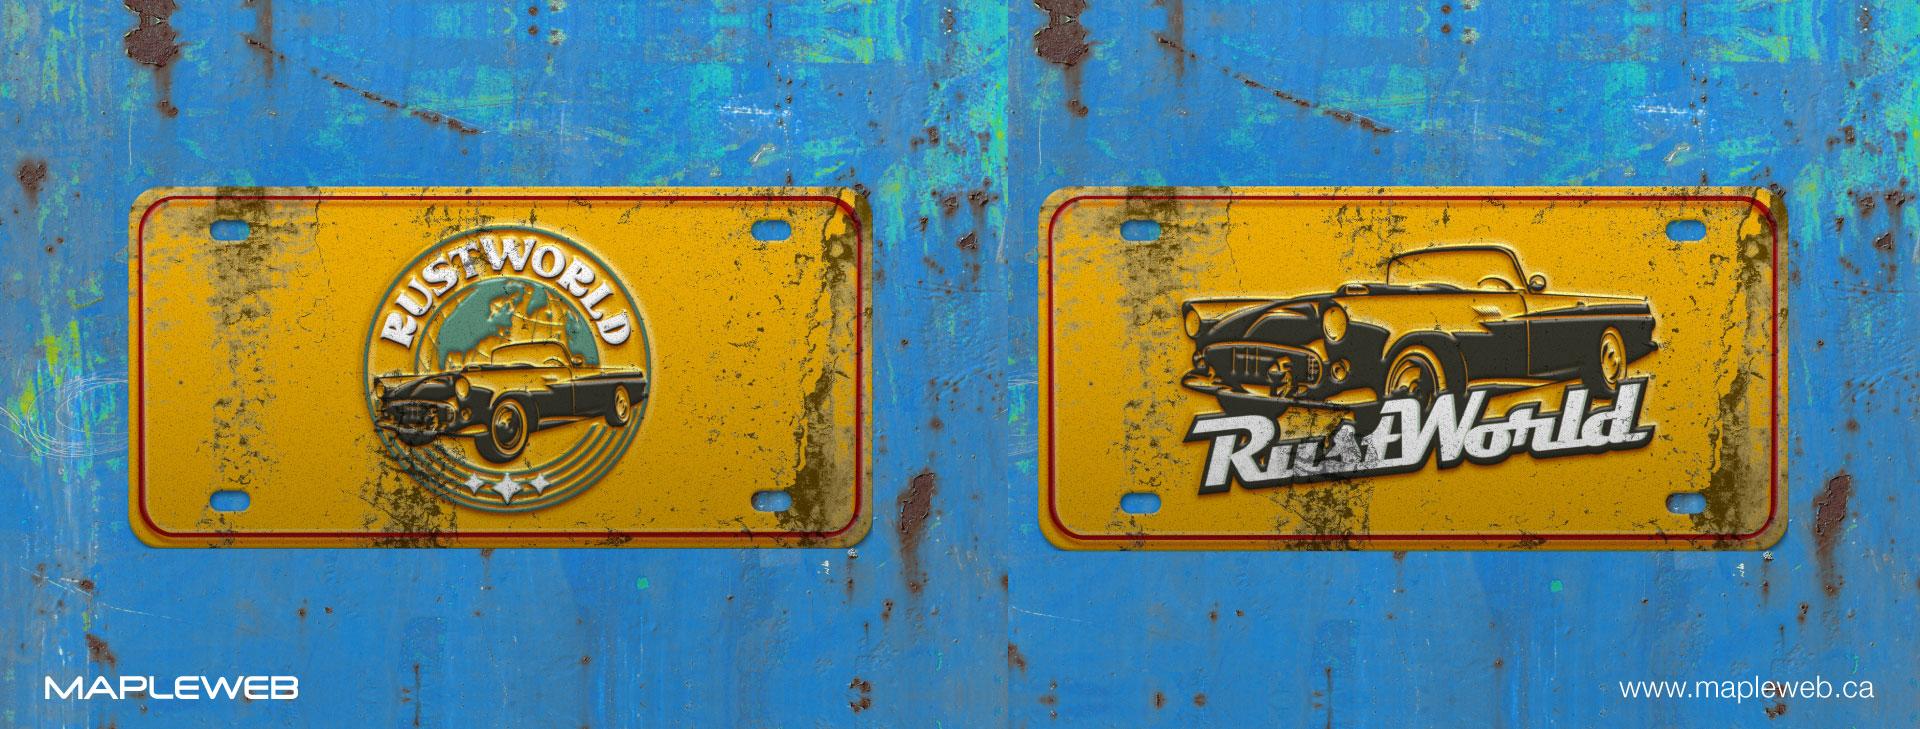 rust-world-brand-logo-design-by-mapleweb-vancouver-canada-license-plate-yellow-rust-mocks